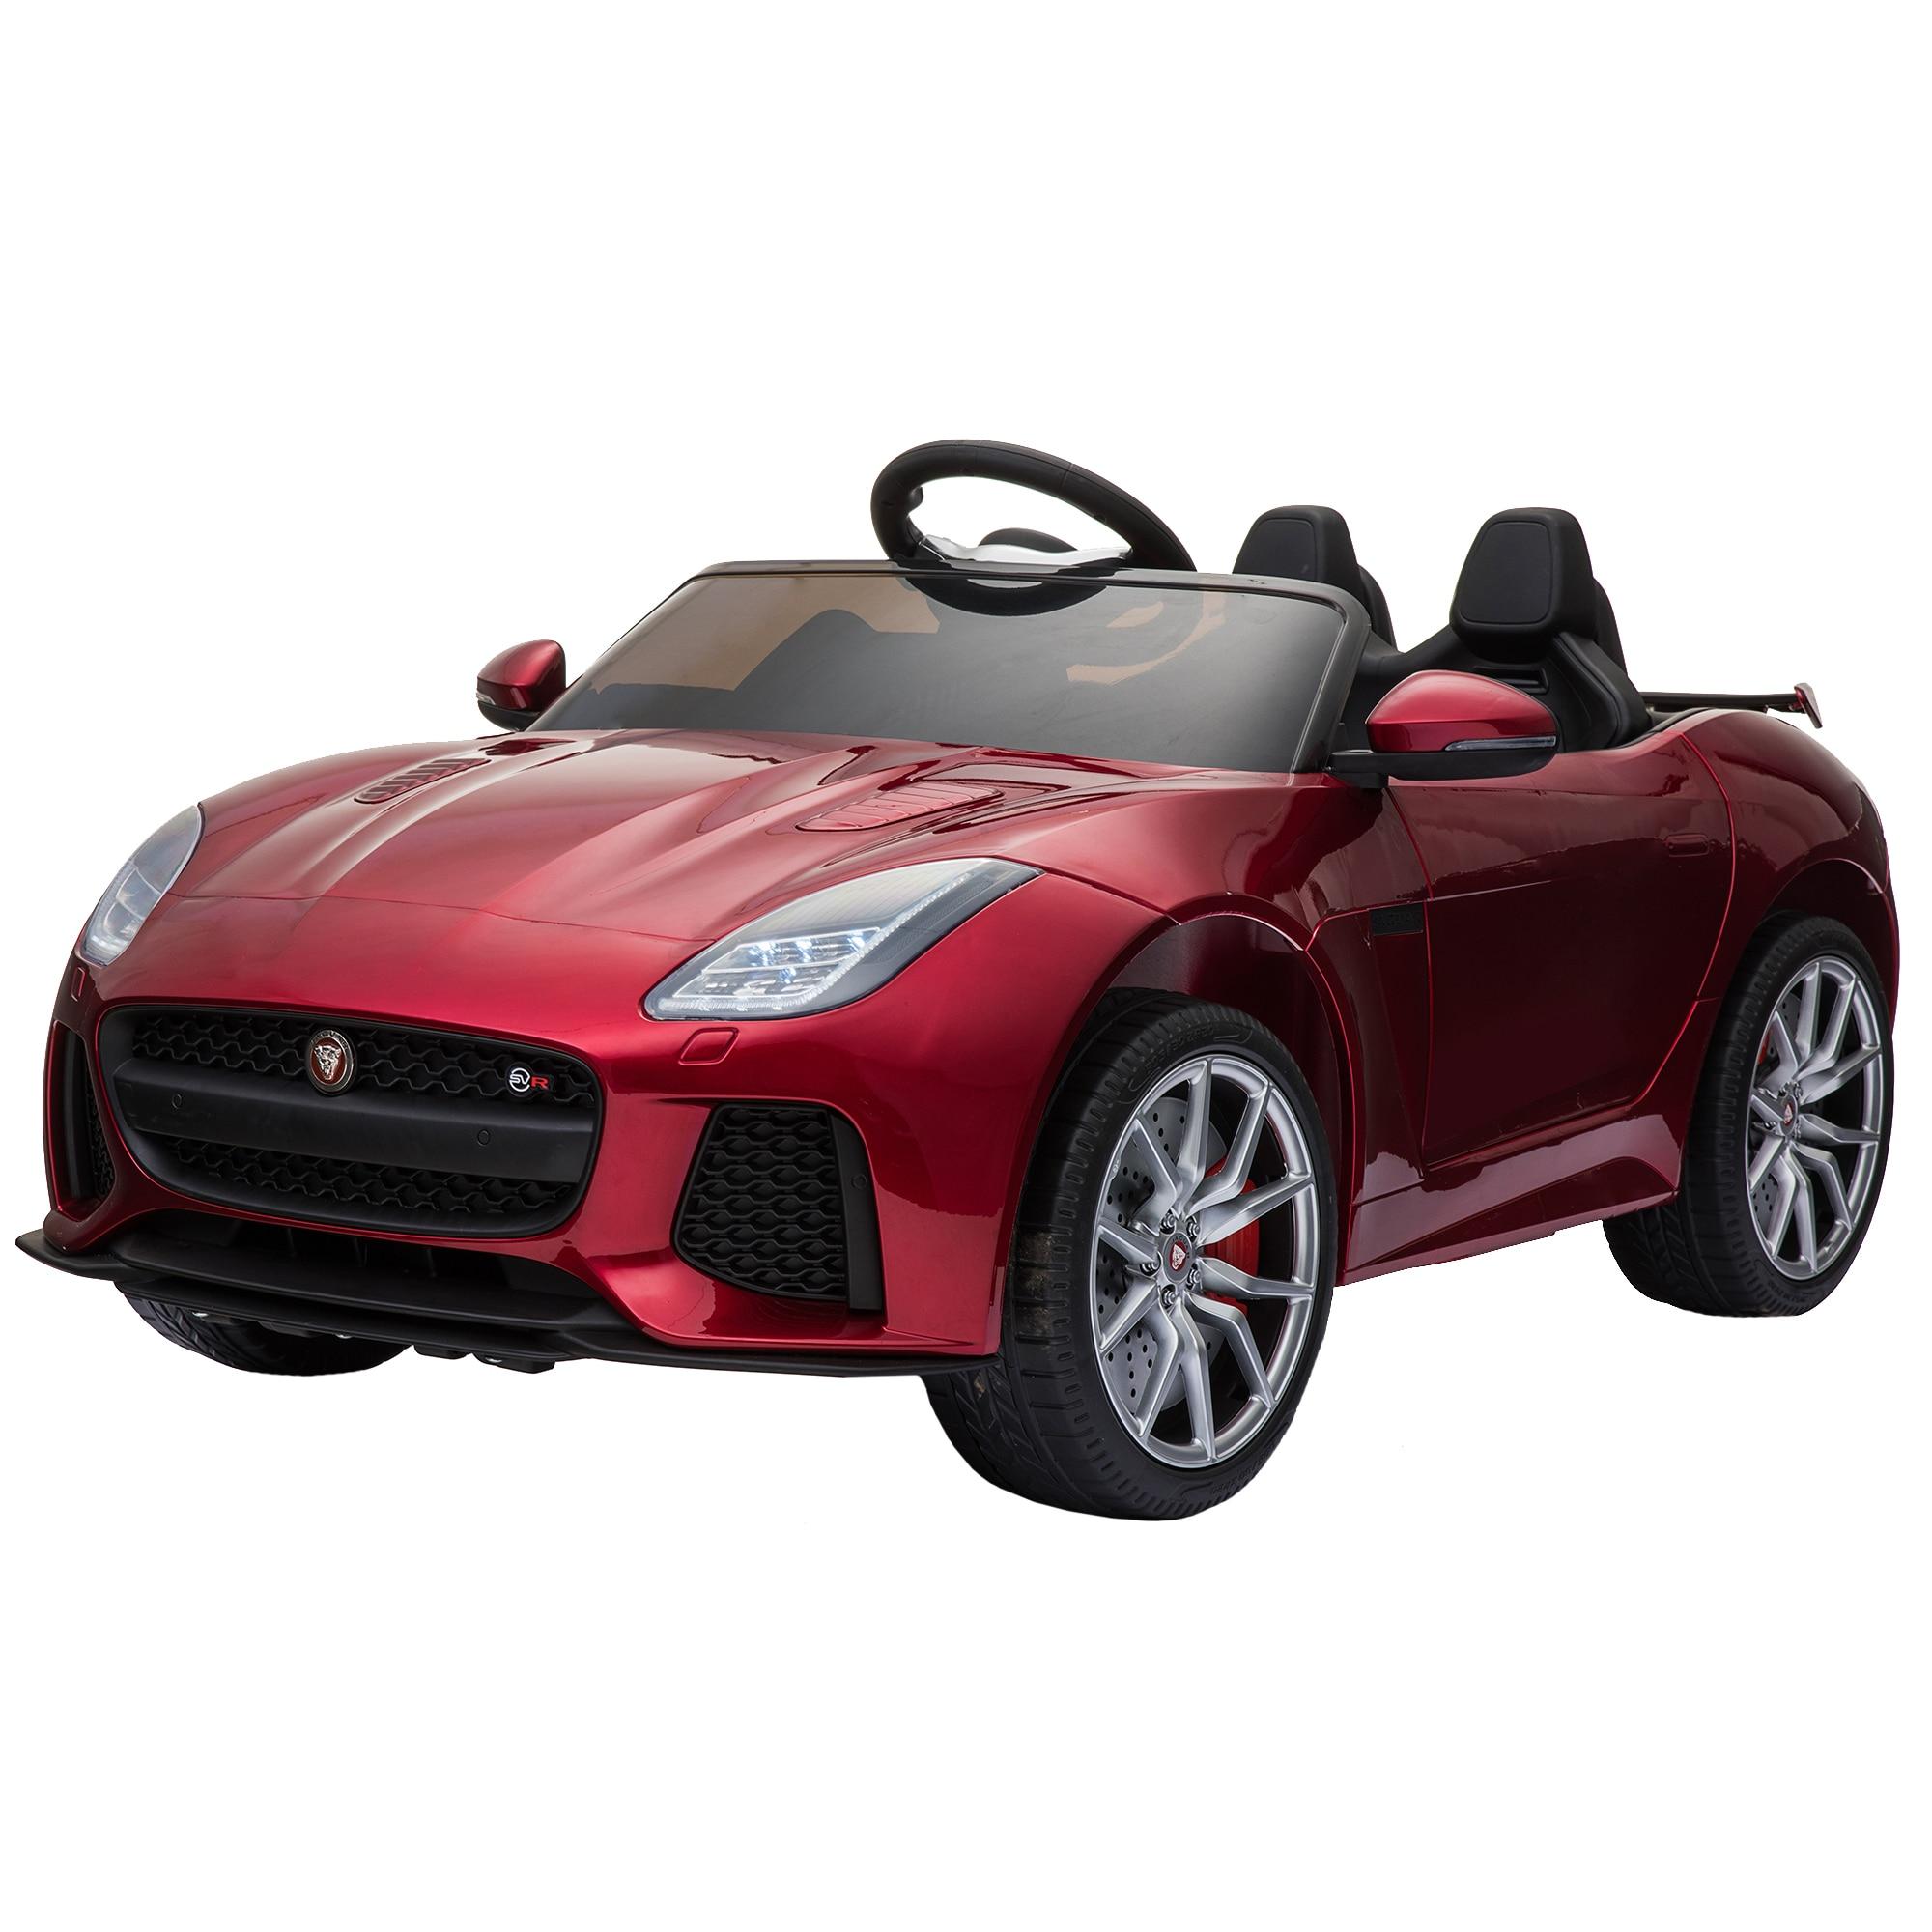 Fotografie Masinuta electrica pentru copii, Mappy Jaguar F-Type, Rosu